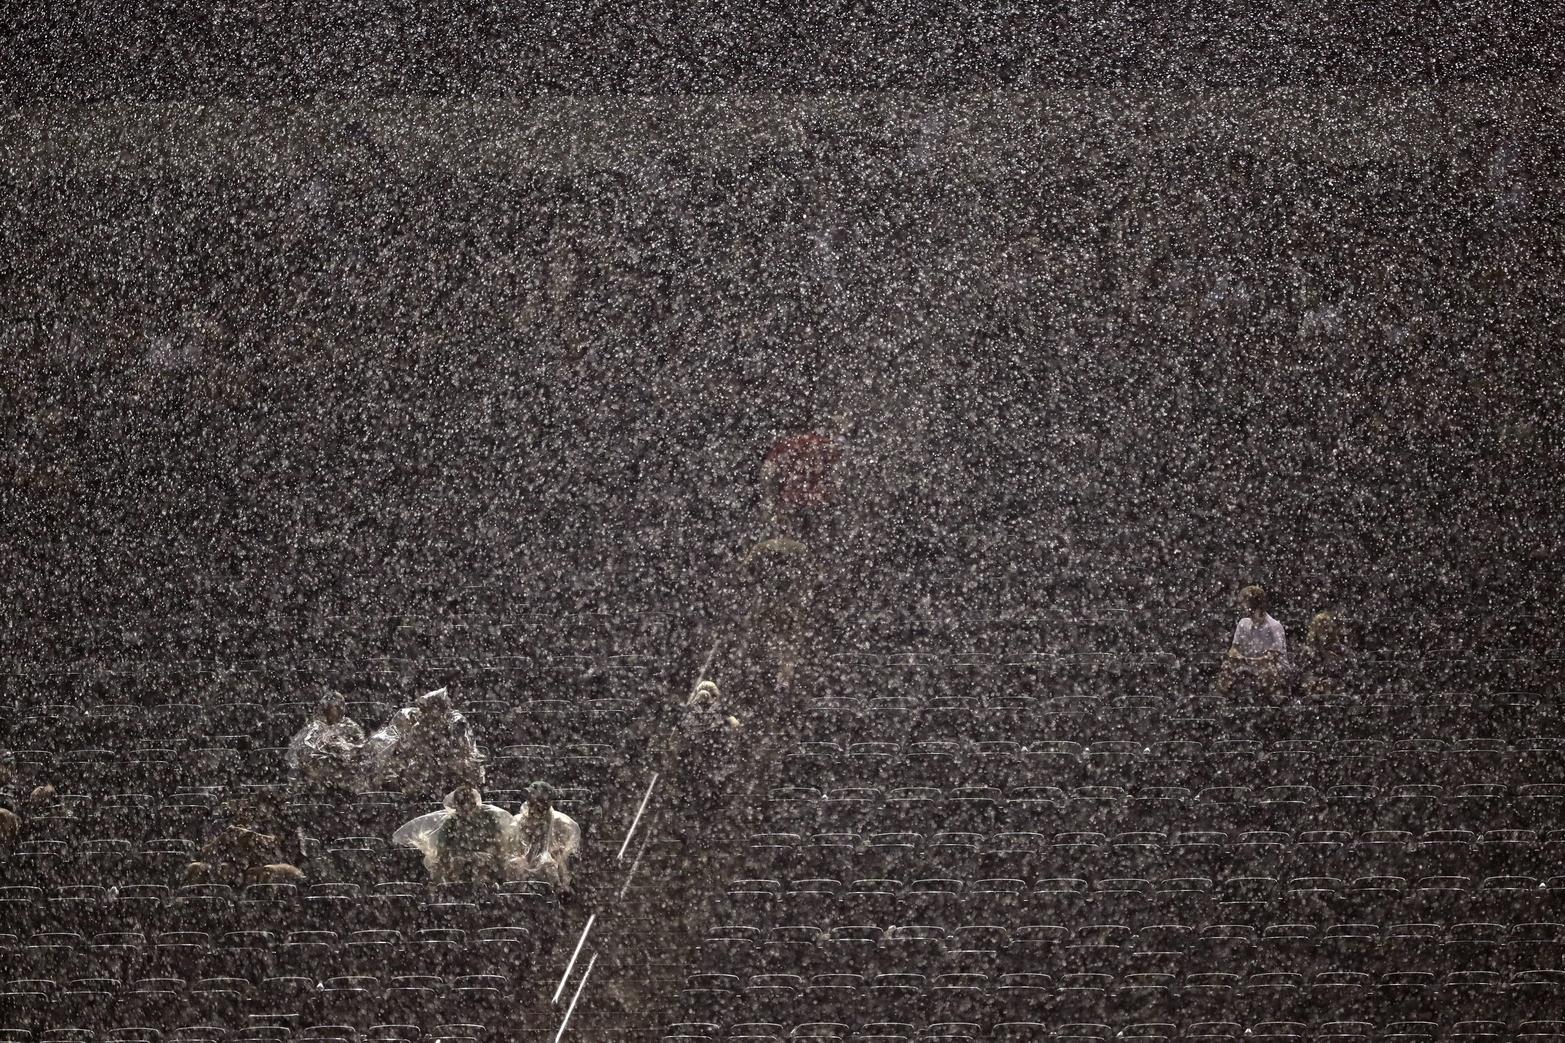 Rain pours down during the second half of a preseason NFL football game between the Philadelphia Eagles and the Baltimore Ravens, Thursday, Aug. 22, 2019, in Philadelphia. (AP Photo/Michael Perez)